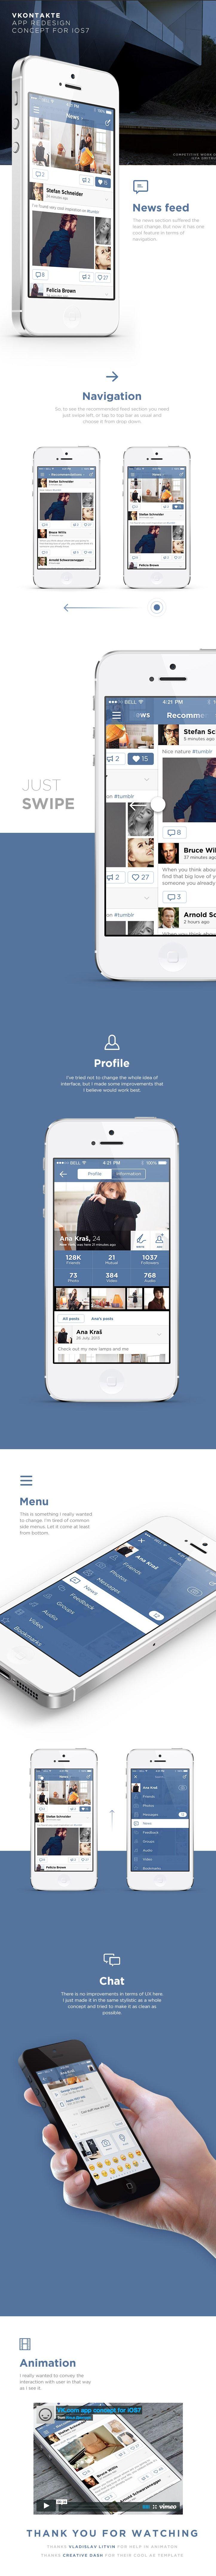 https://www.behance.net/gallery/VKcom-app-concept-for-iOS7/10547425